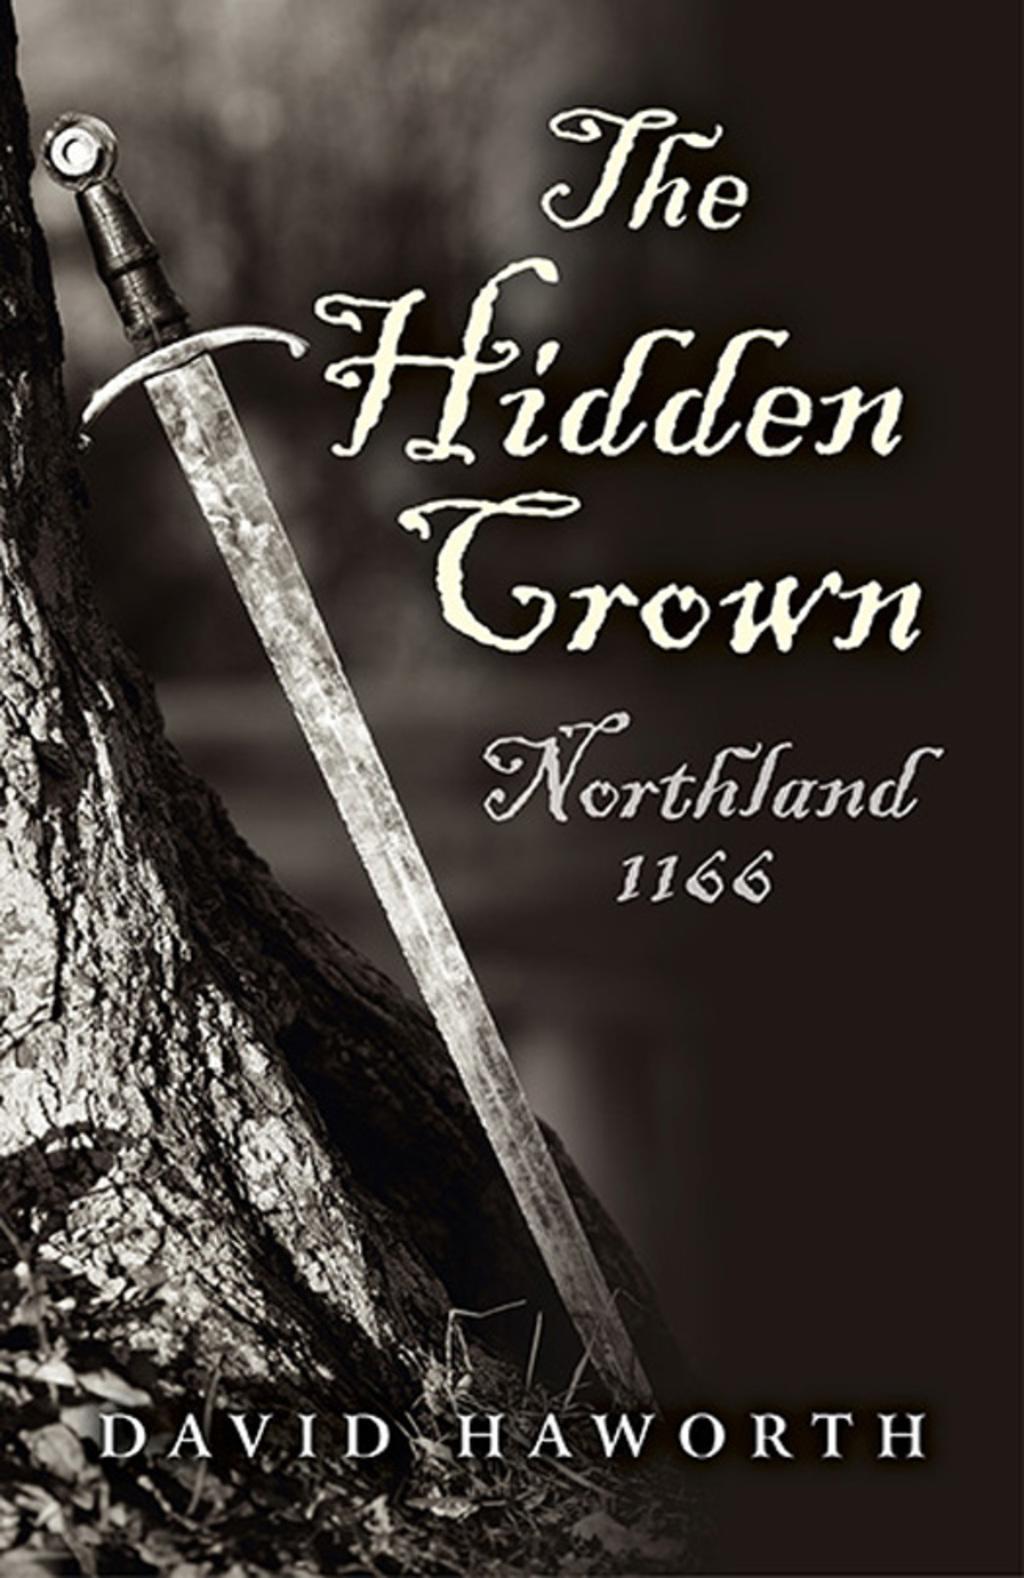 The Hidden Crown: Northland - 1166 (eBook)